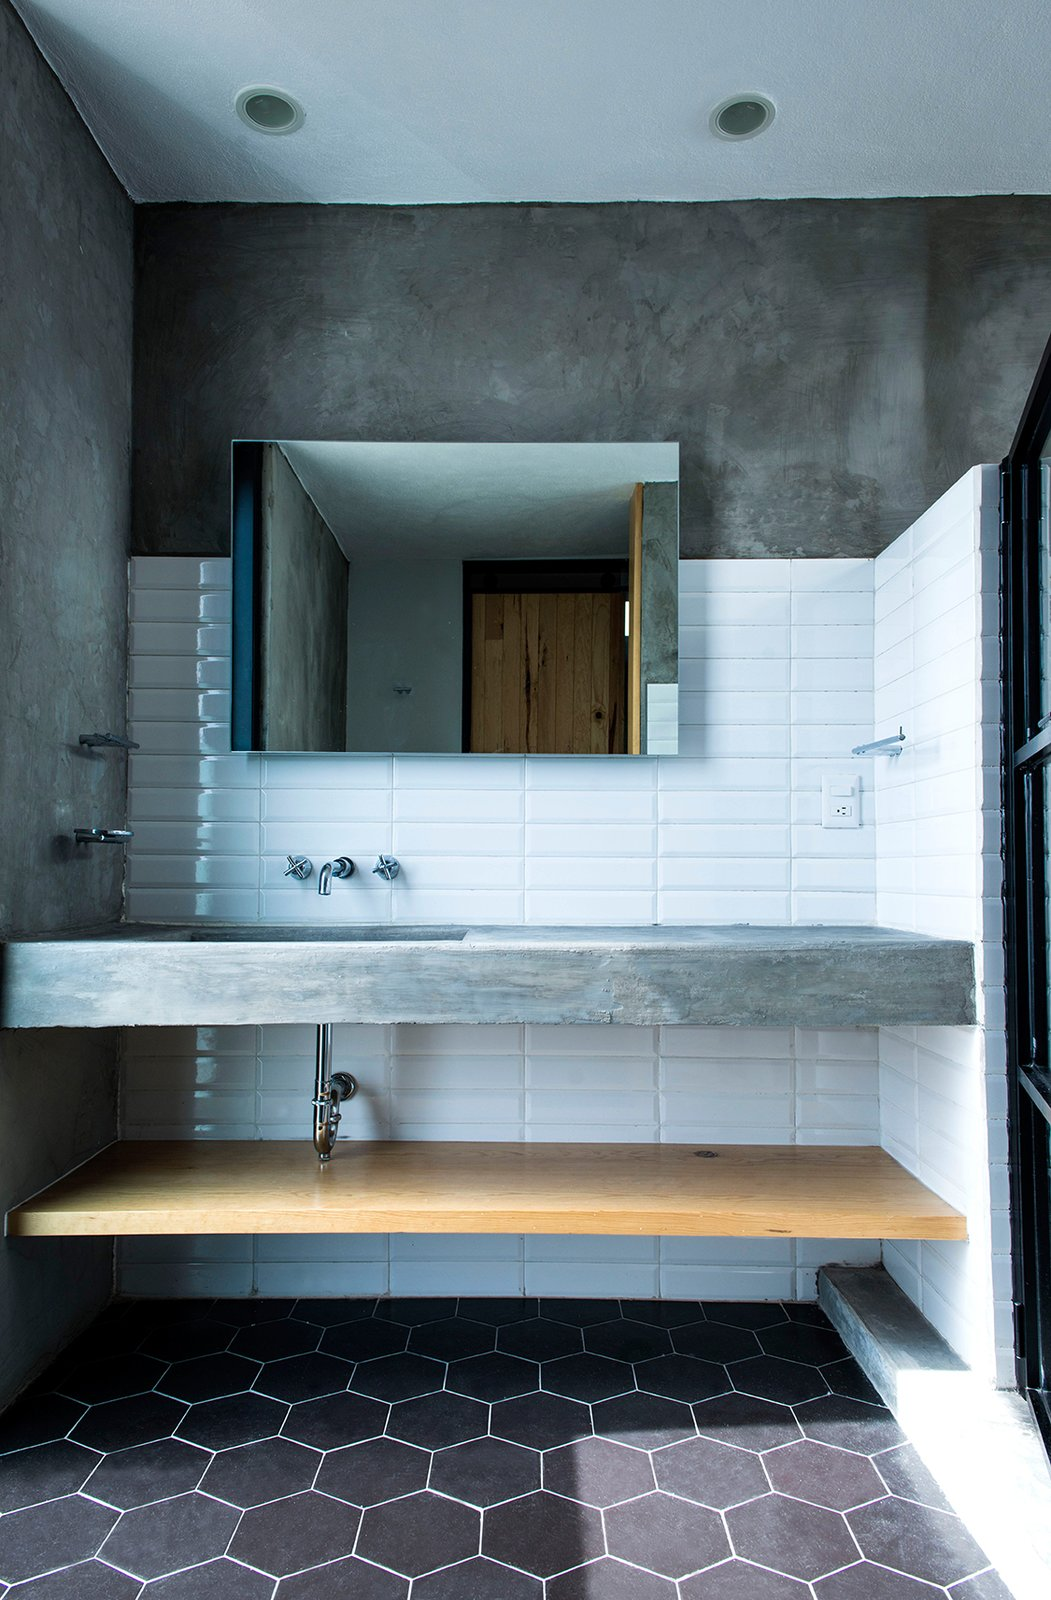 Main Bathroom Tagged: Bath Room, Concrete Counter, Undermount Sink, Ceramic Tile Floor, and Subway Tile Wall.  Casa MA by e|arquitectos